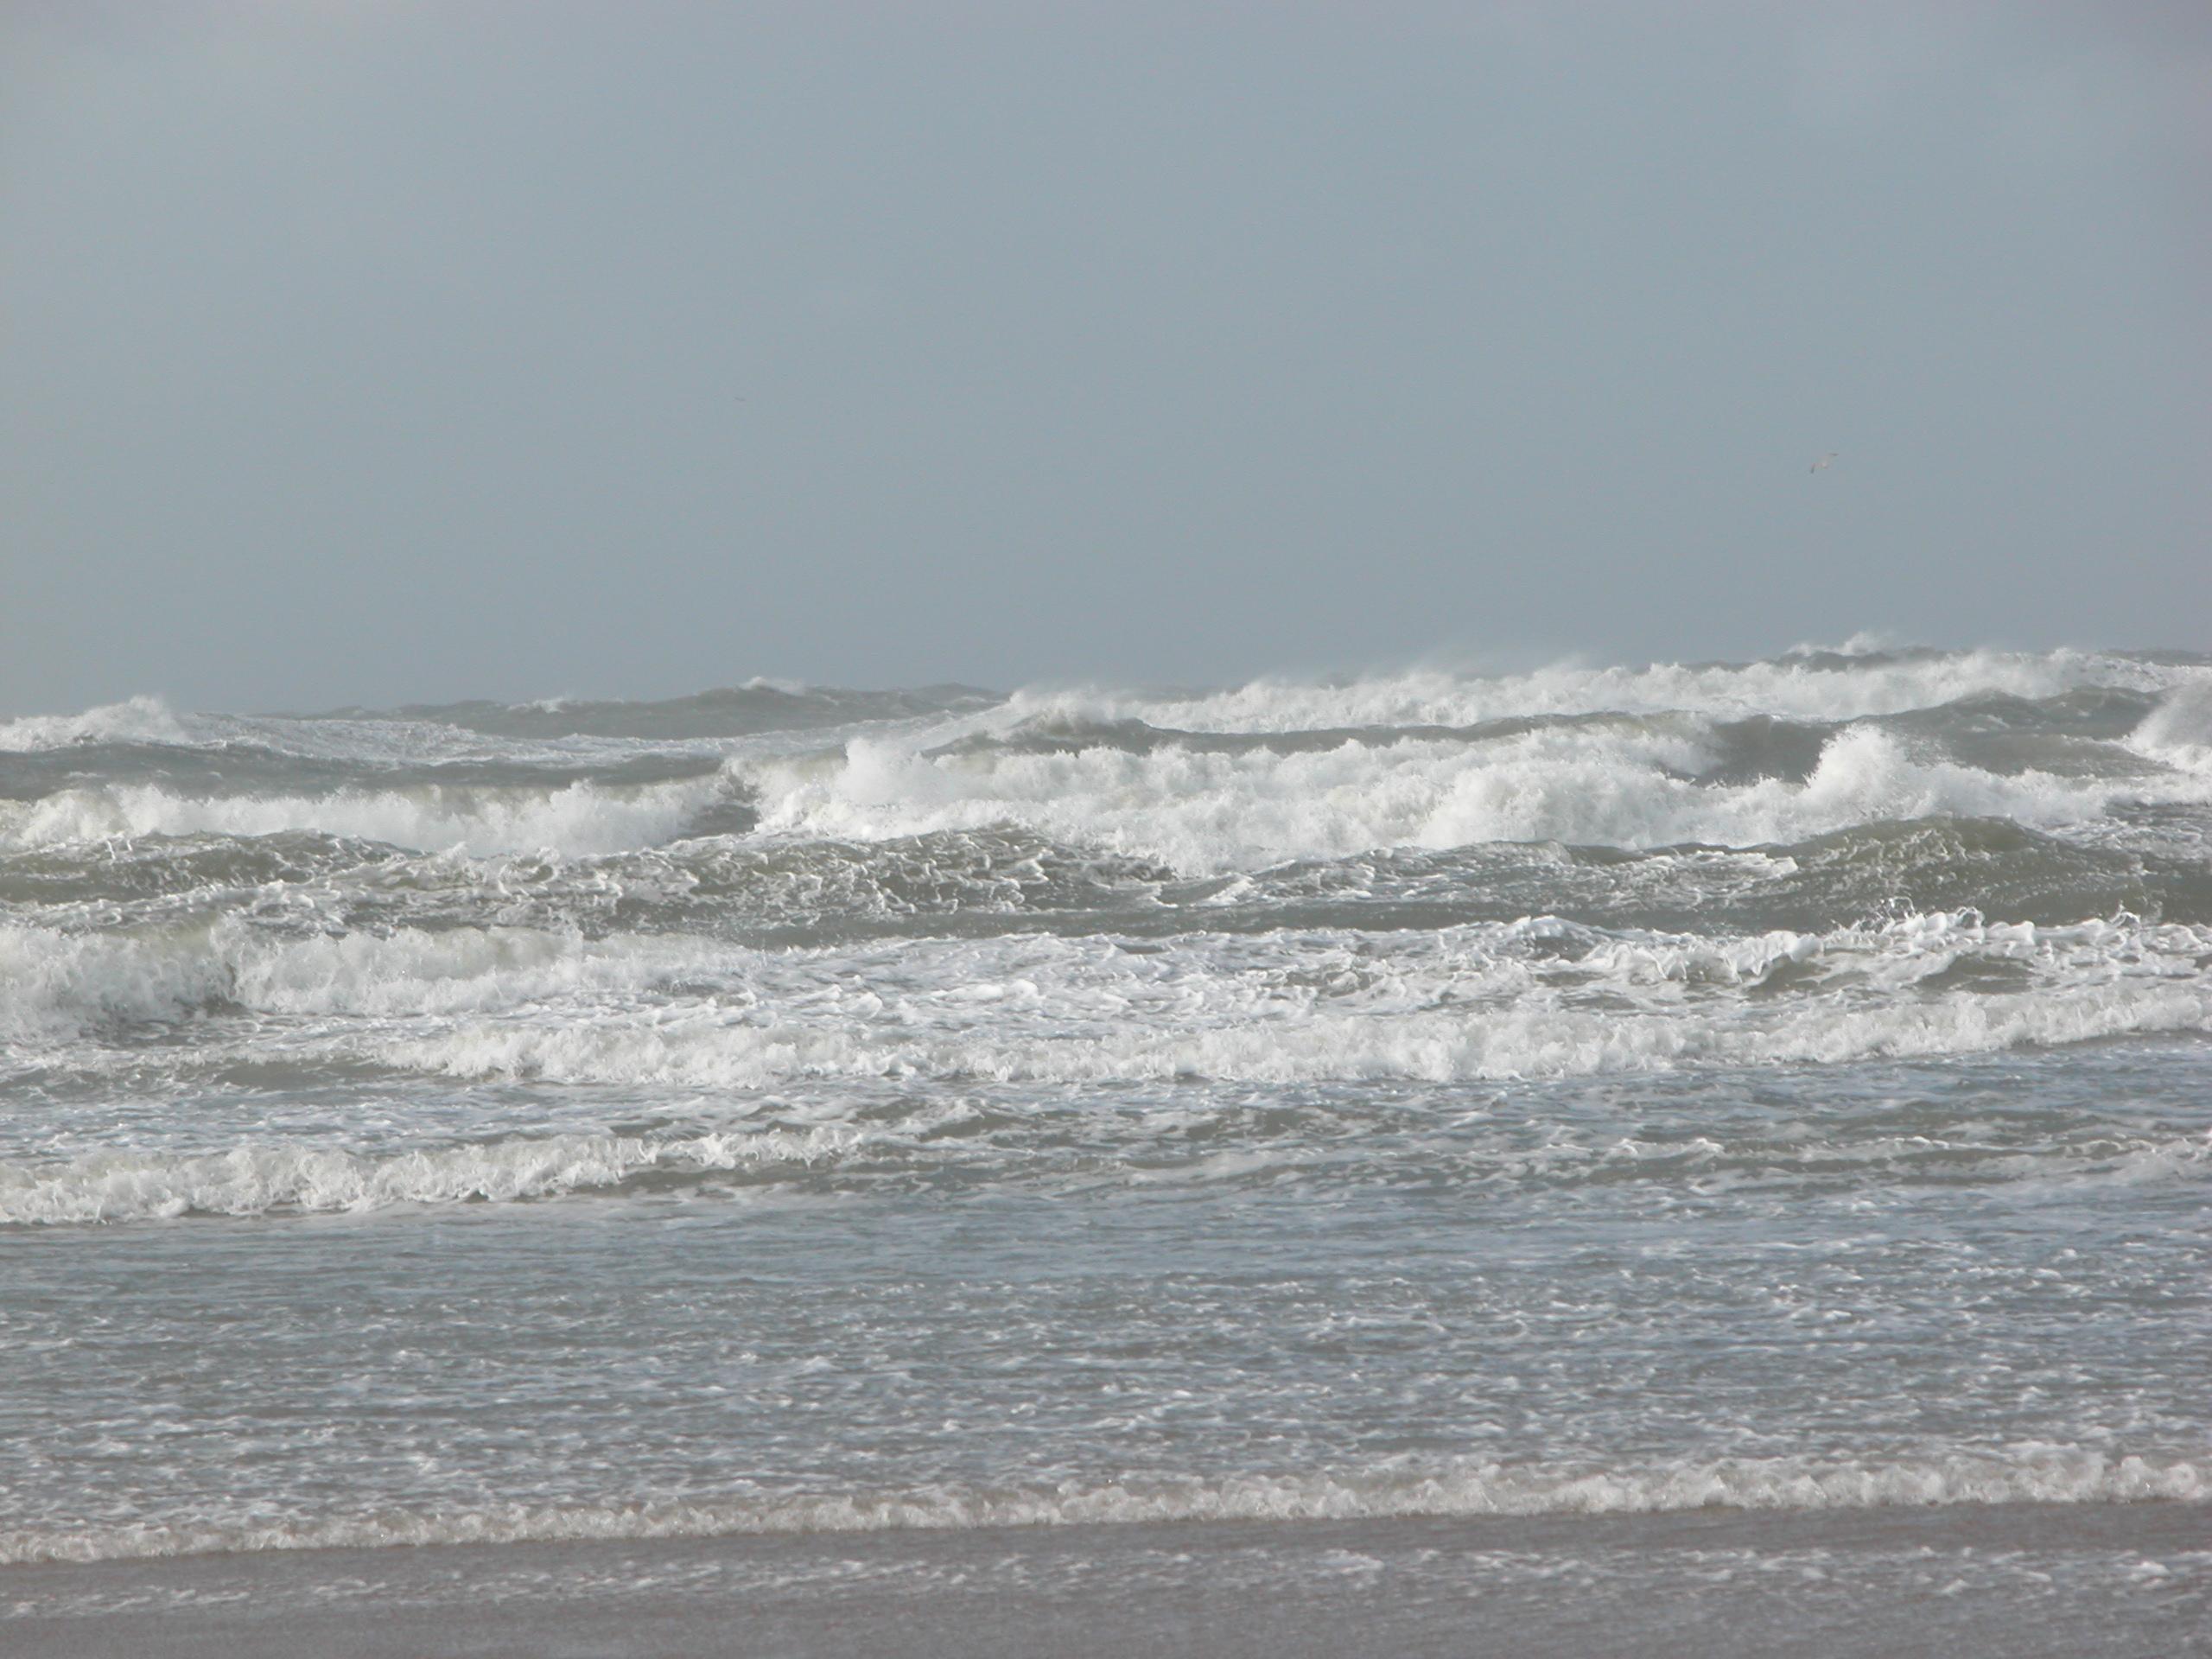 sea wave waves crashing cold windy day grey gray